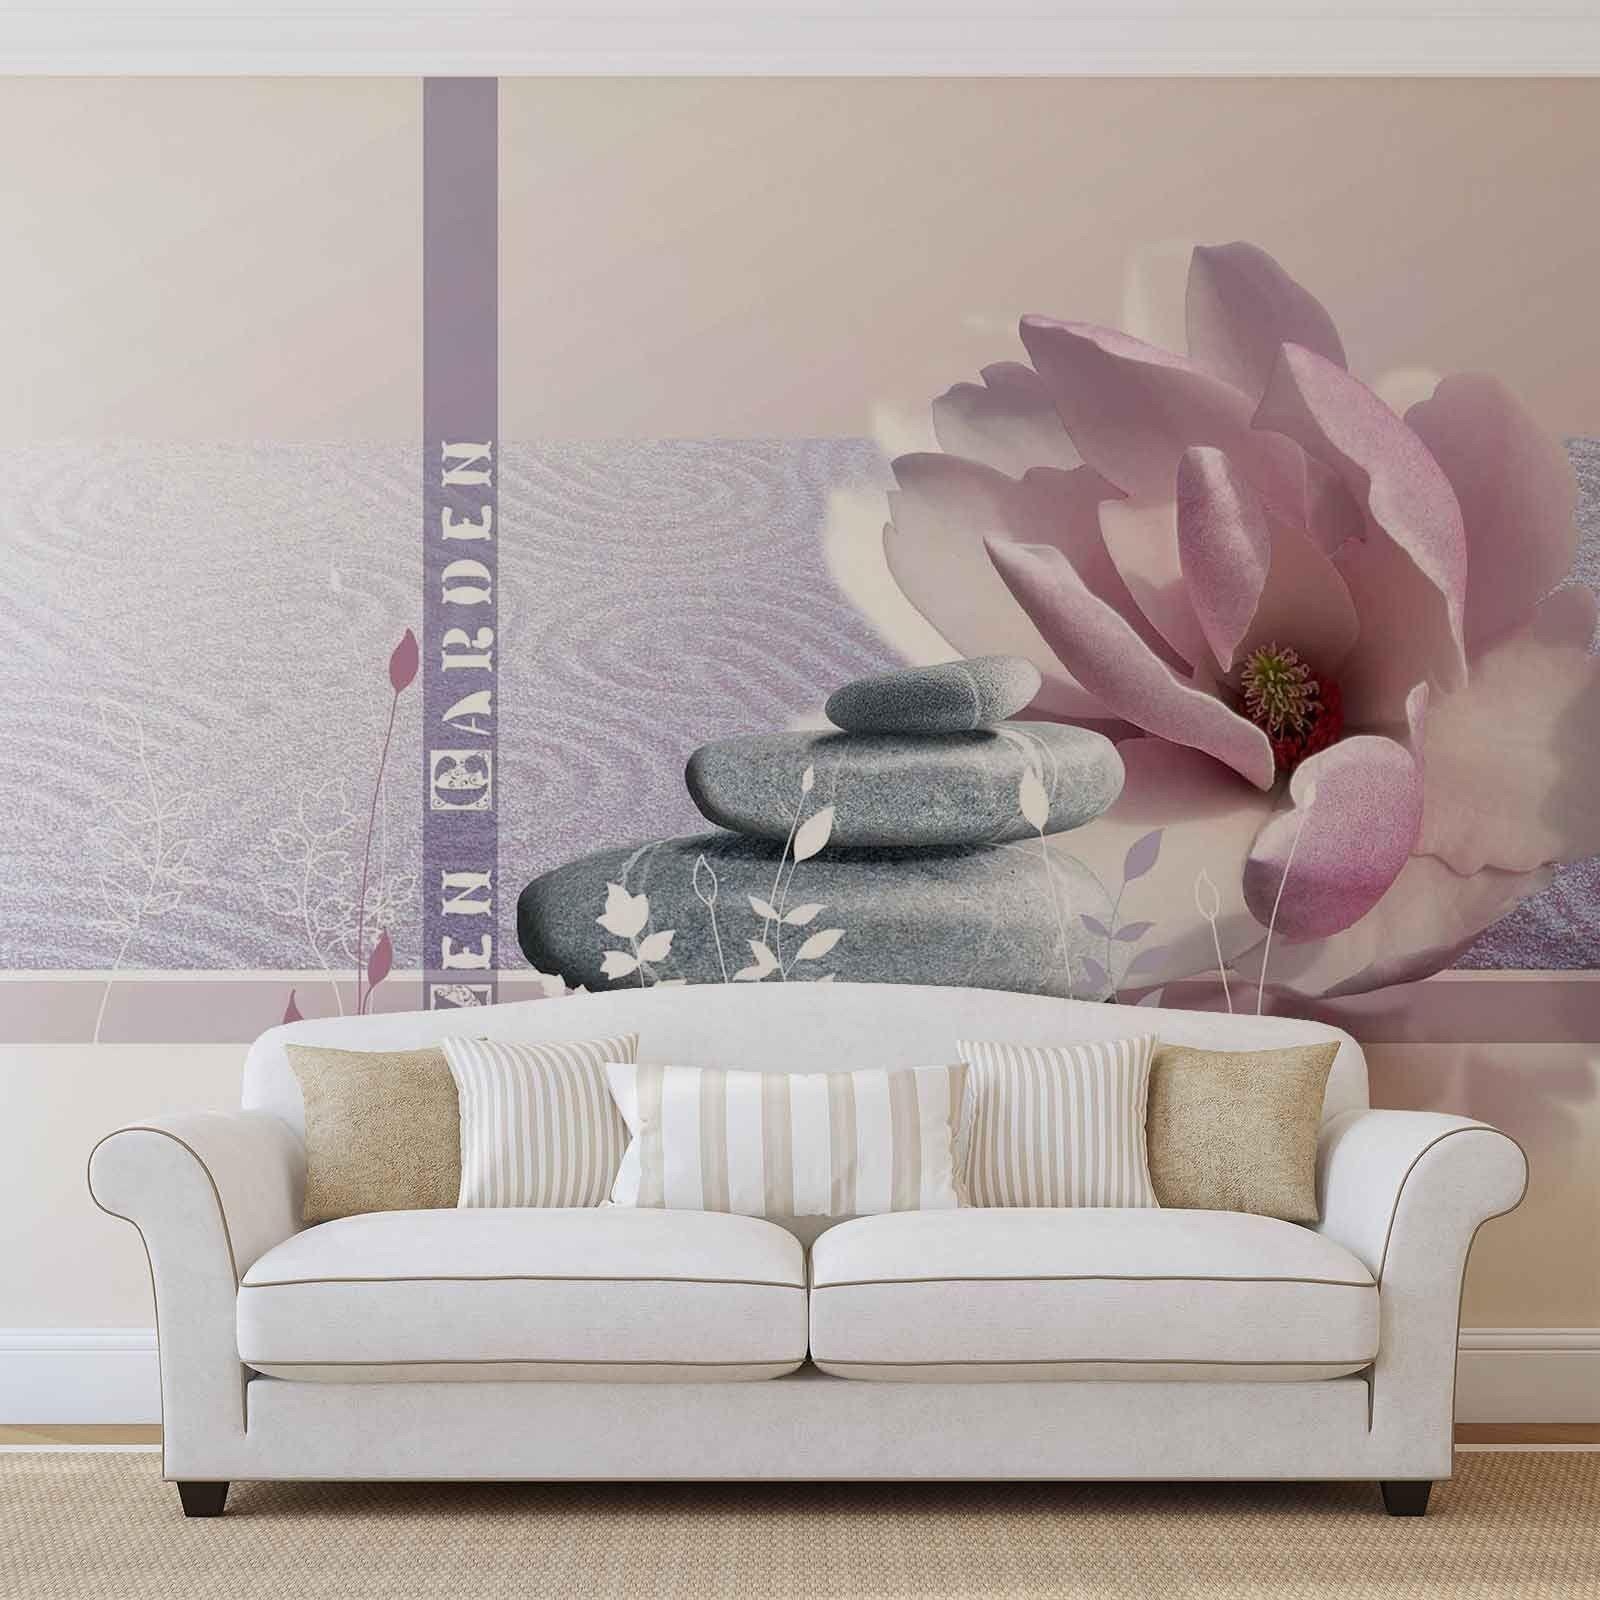 Tapete Vlies Fototapete Wellness & Spa Zen Garden Basaltsteine Lotusblüte